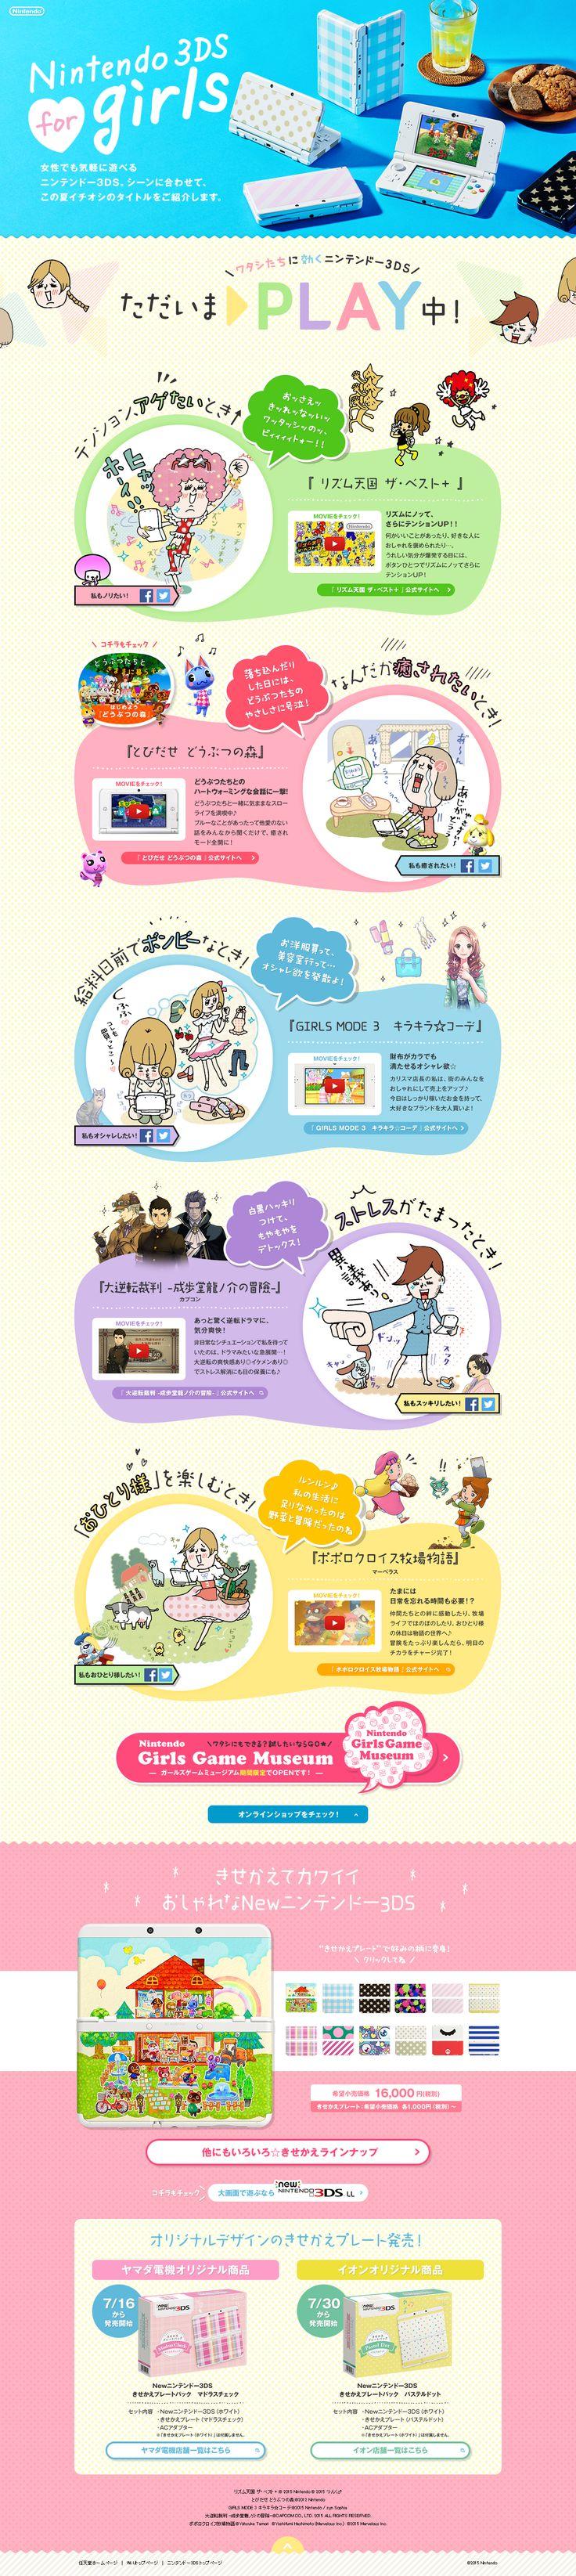 http://www.nintendo.co.jp/nintendo_girls/index.html